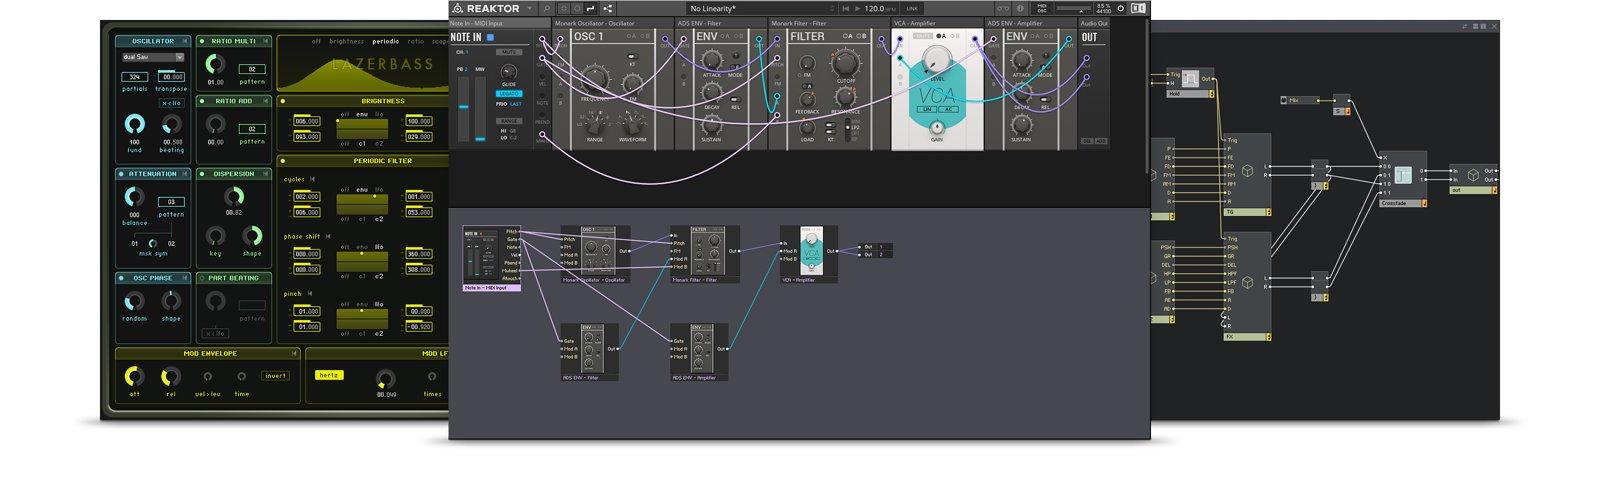 Native Instruments Reaktor gets its biggest update yet